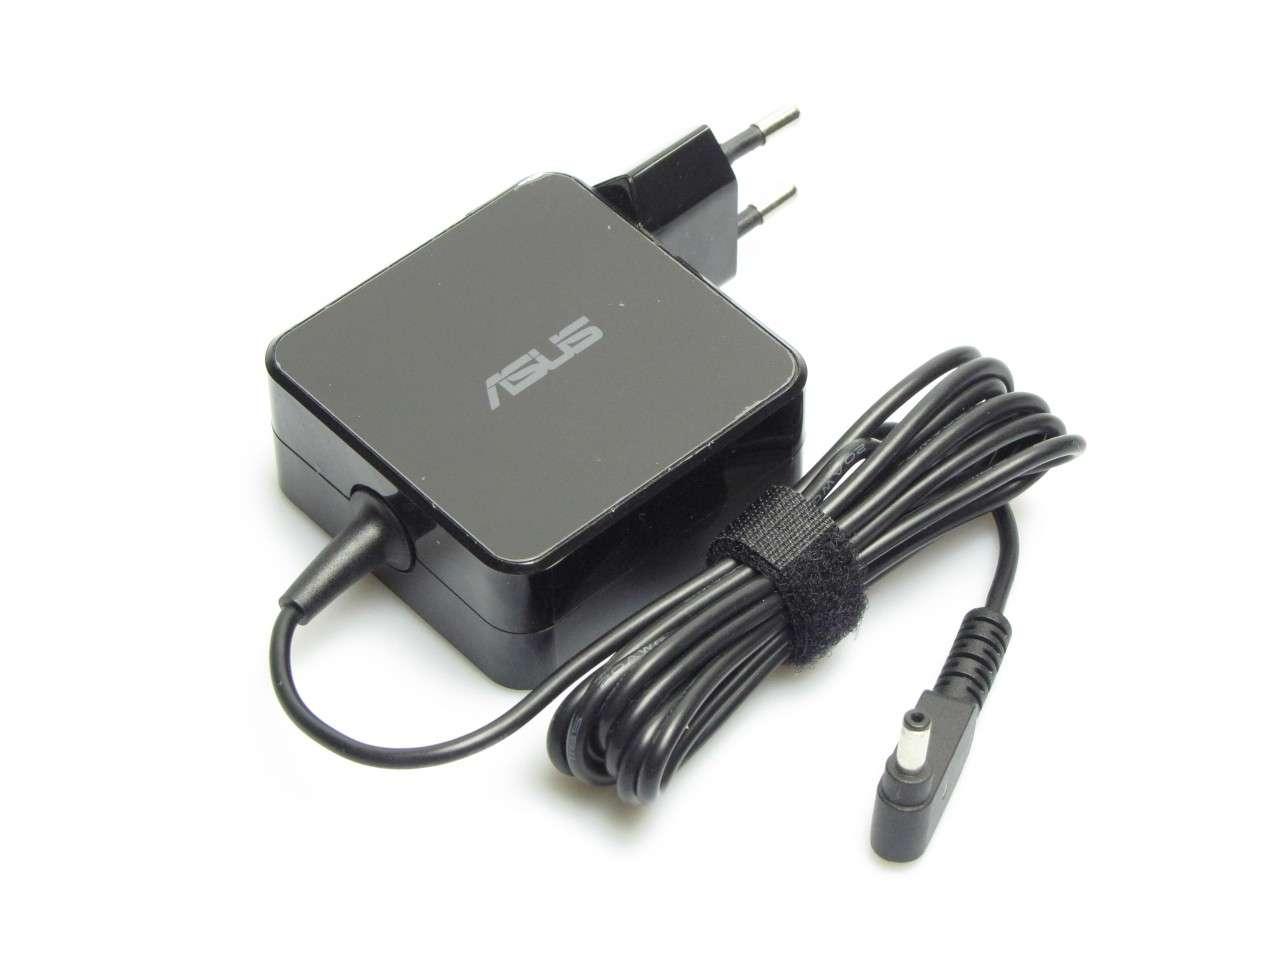 Incarcator Asus 0A001-00045900 Square Shape 65W imagine powerlaptop.ro 2021